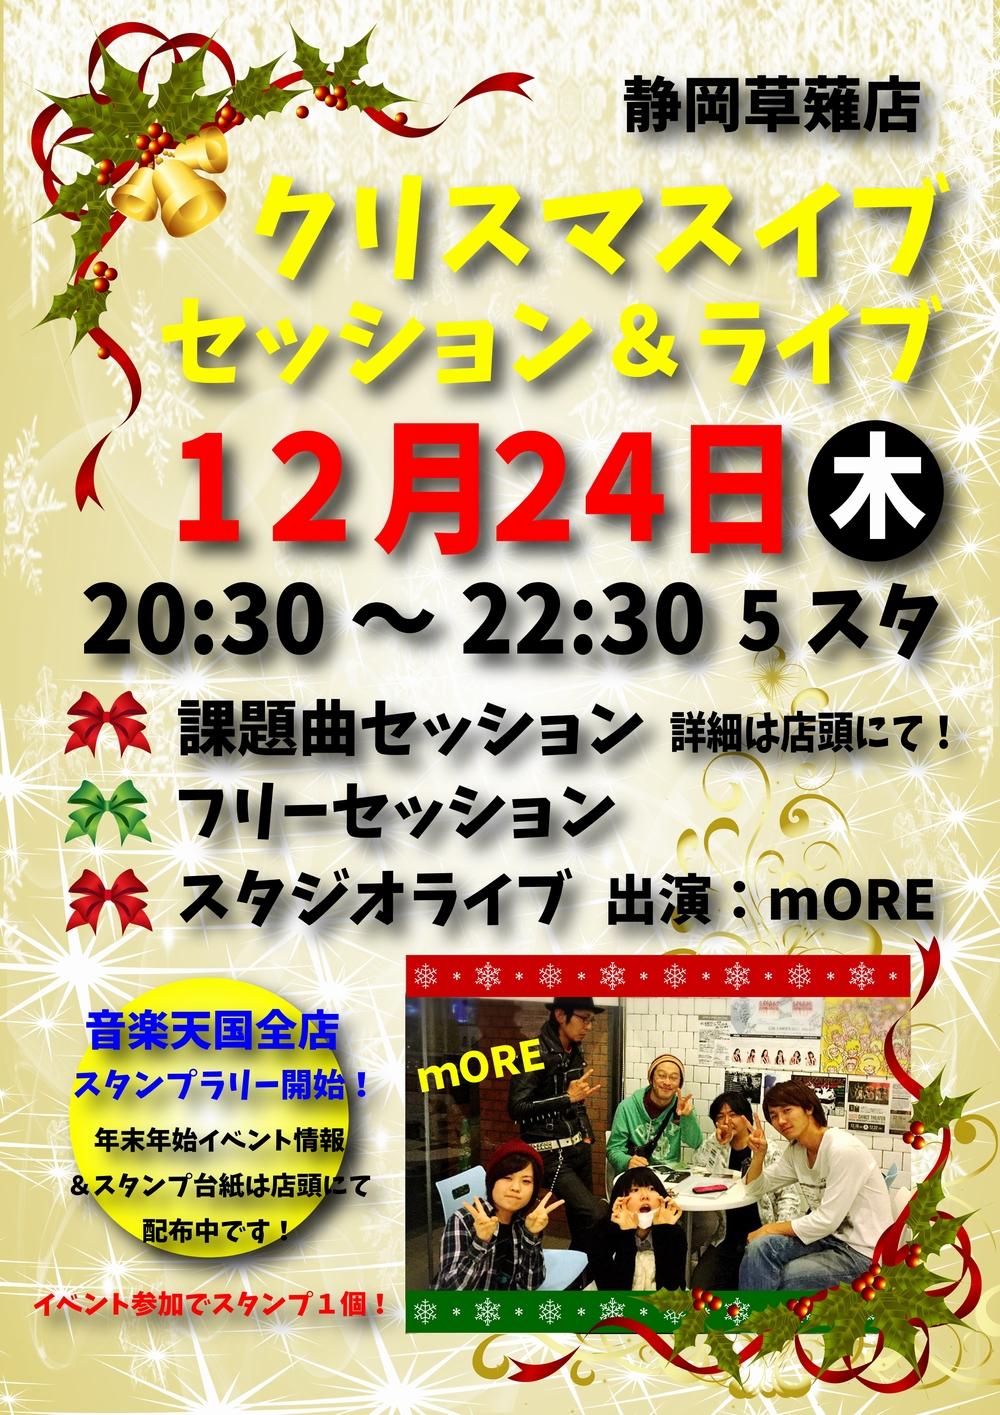 X'mas【セッション天国&スタジオライブ】音楽天国・静岡草薙店12月24日(木)開催!